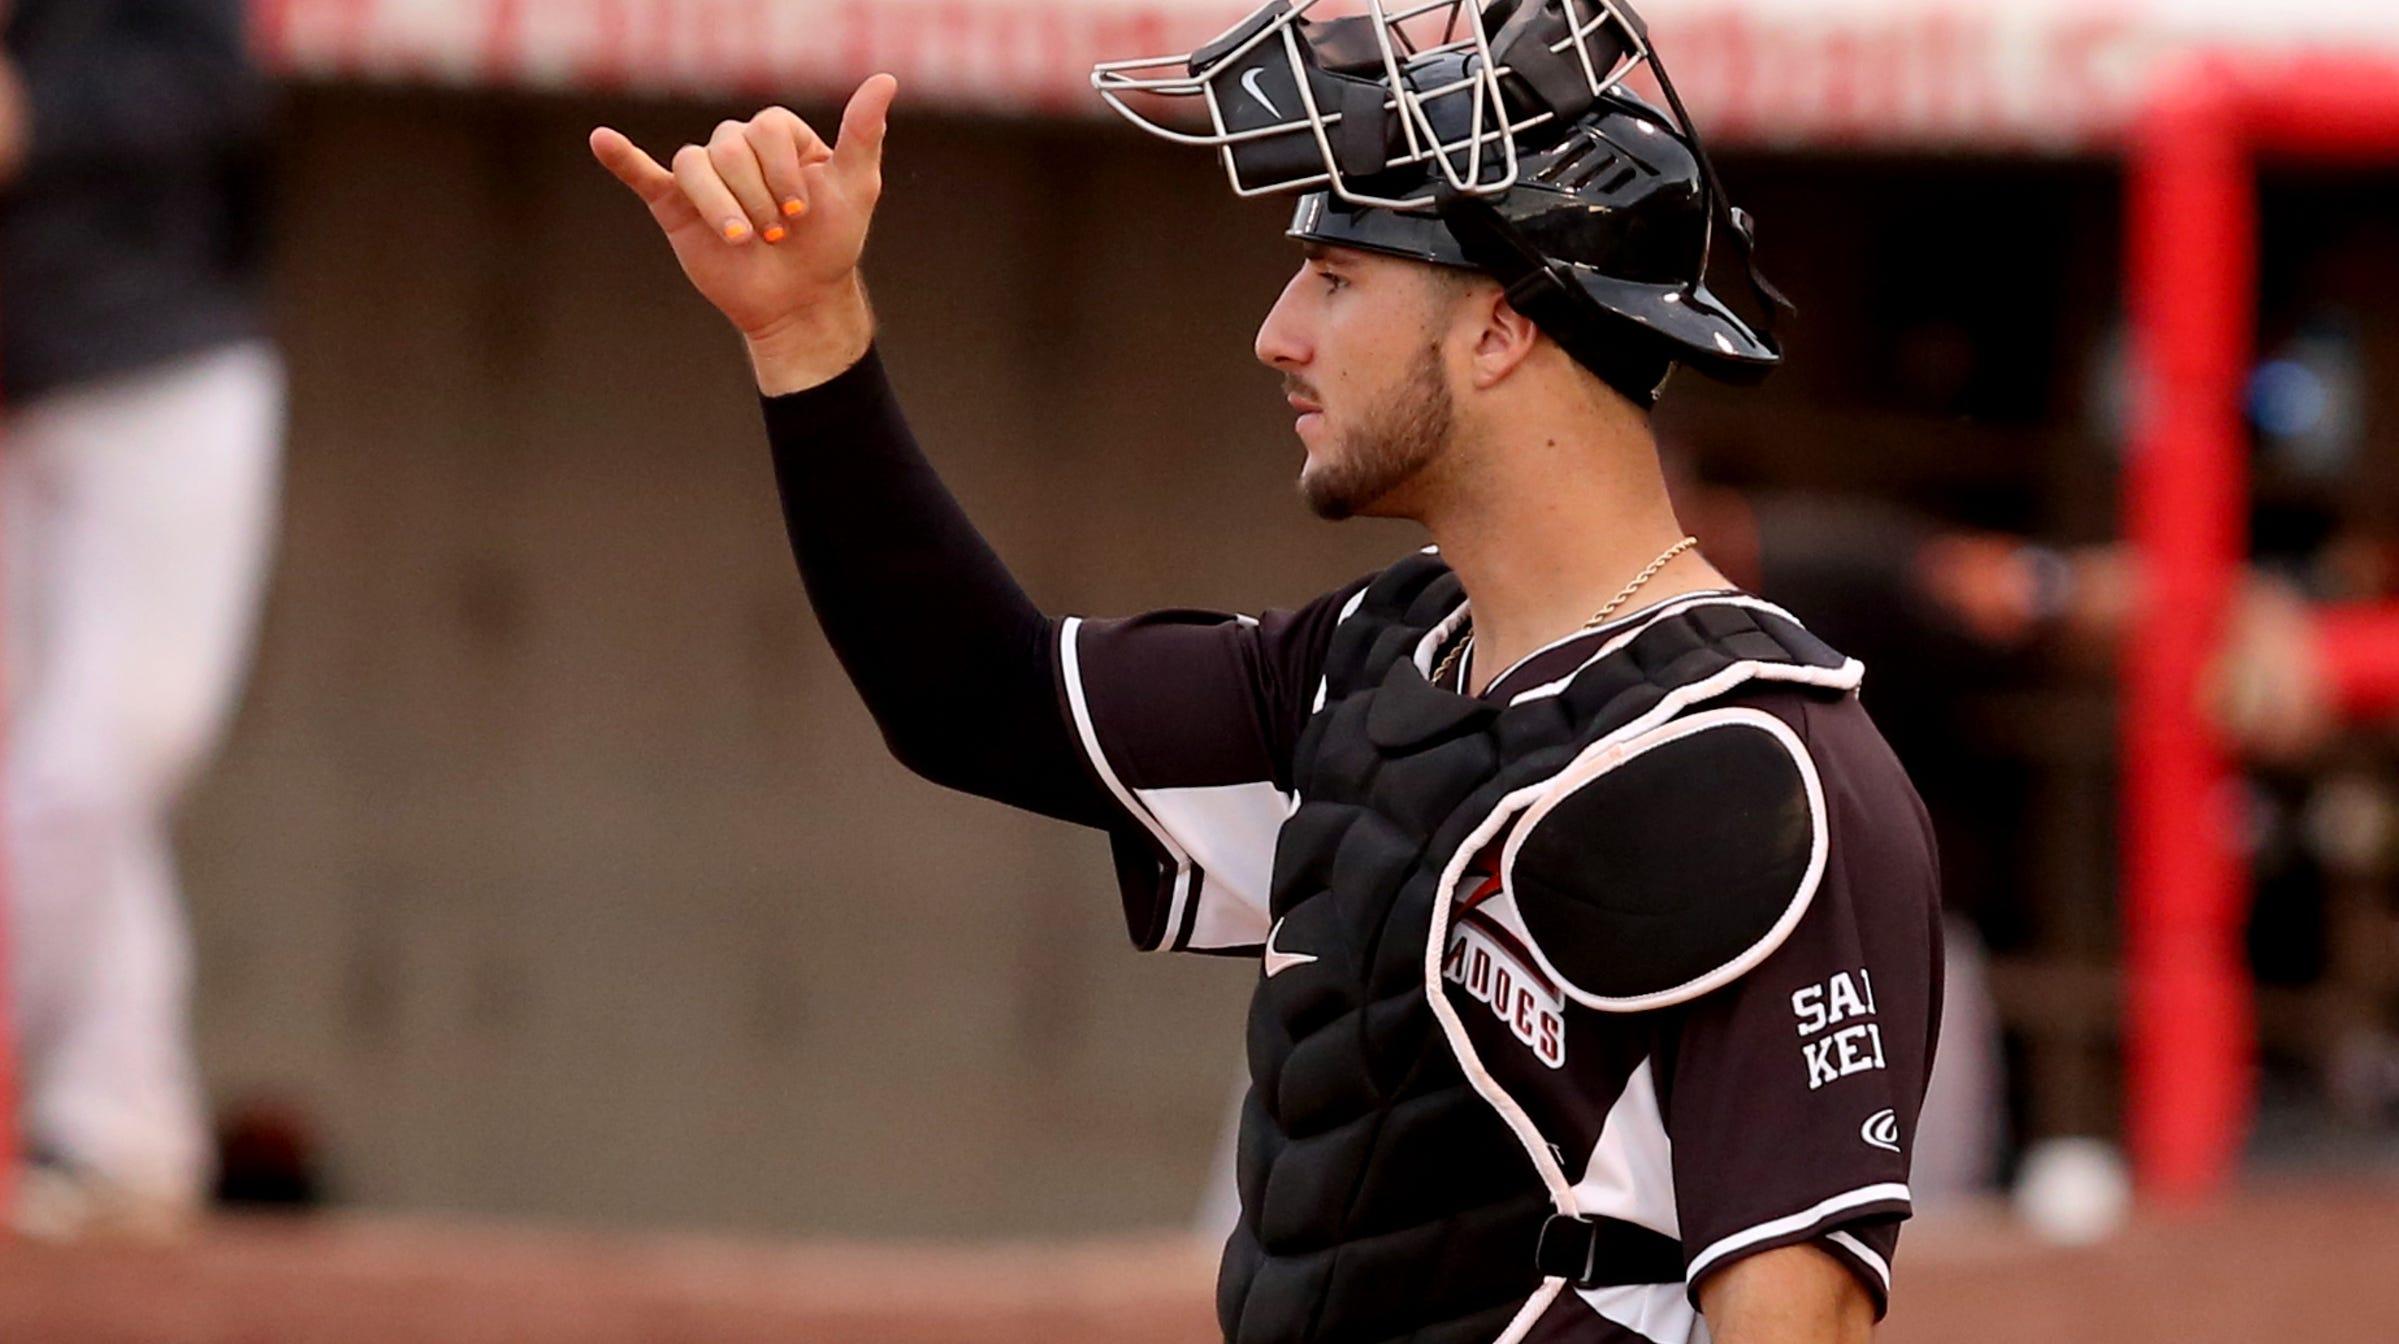 Volcanoes' Joey Bart boosts batting average to .346